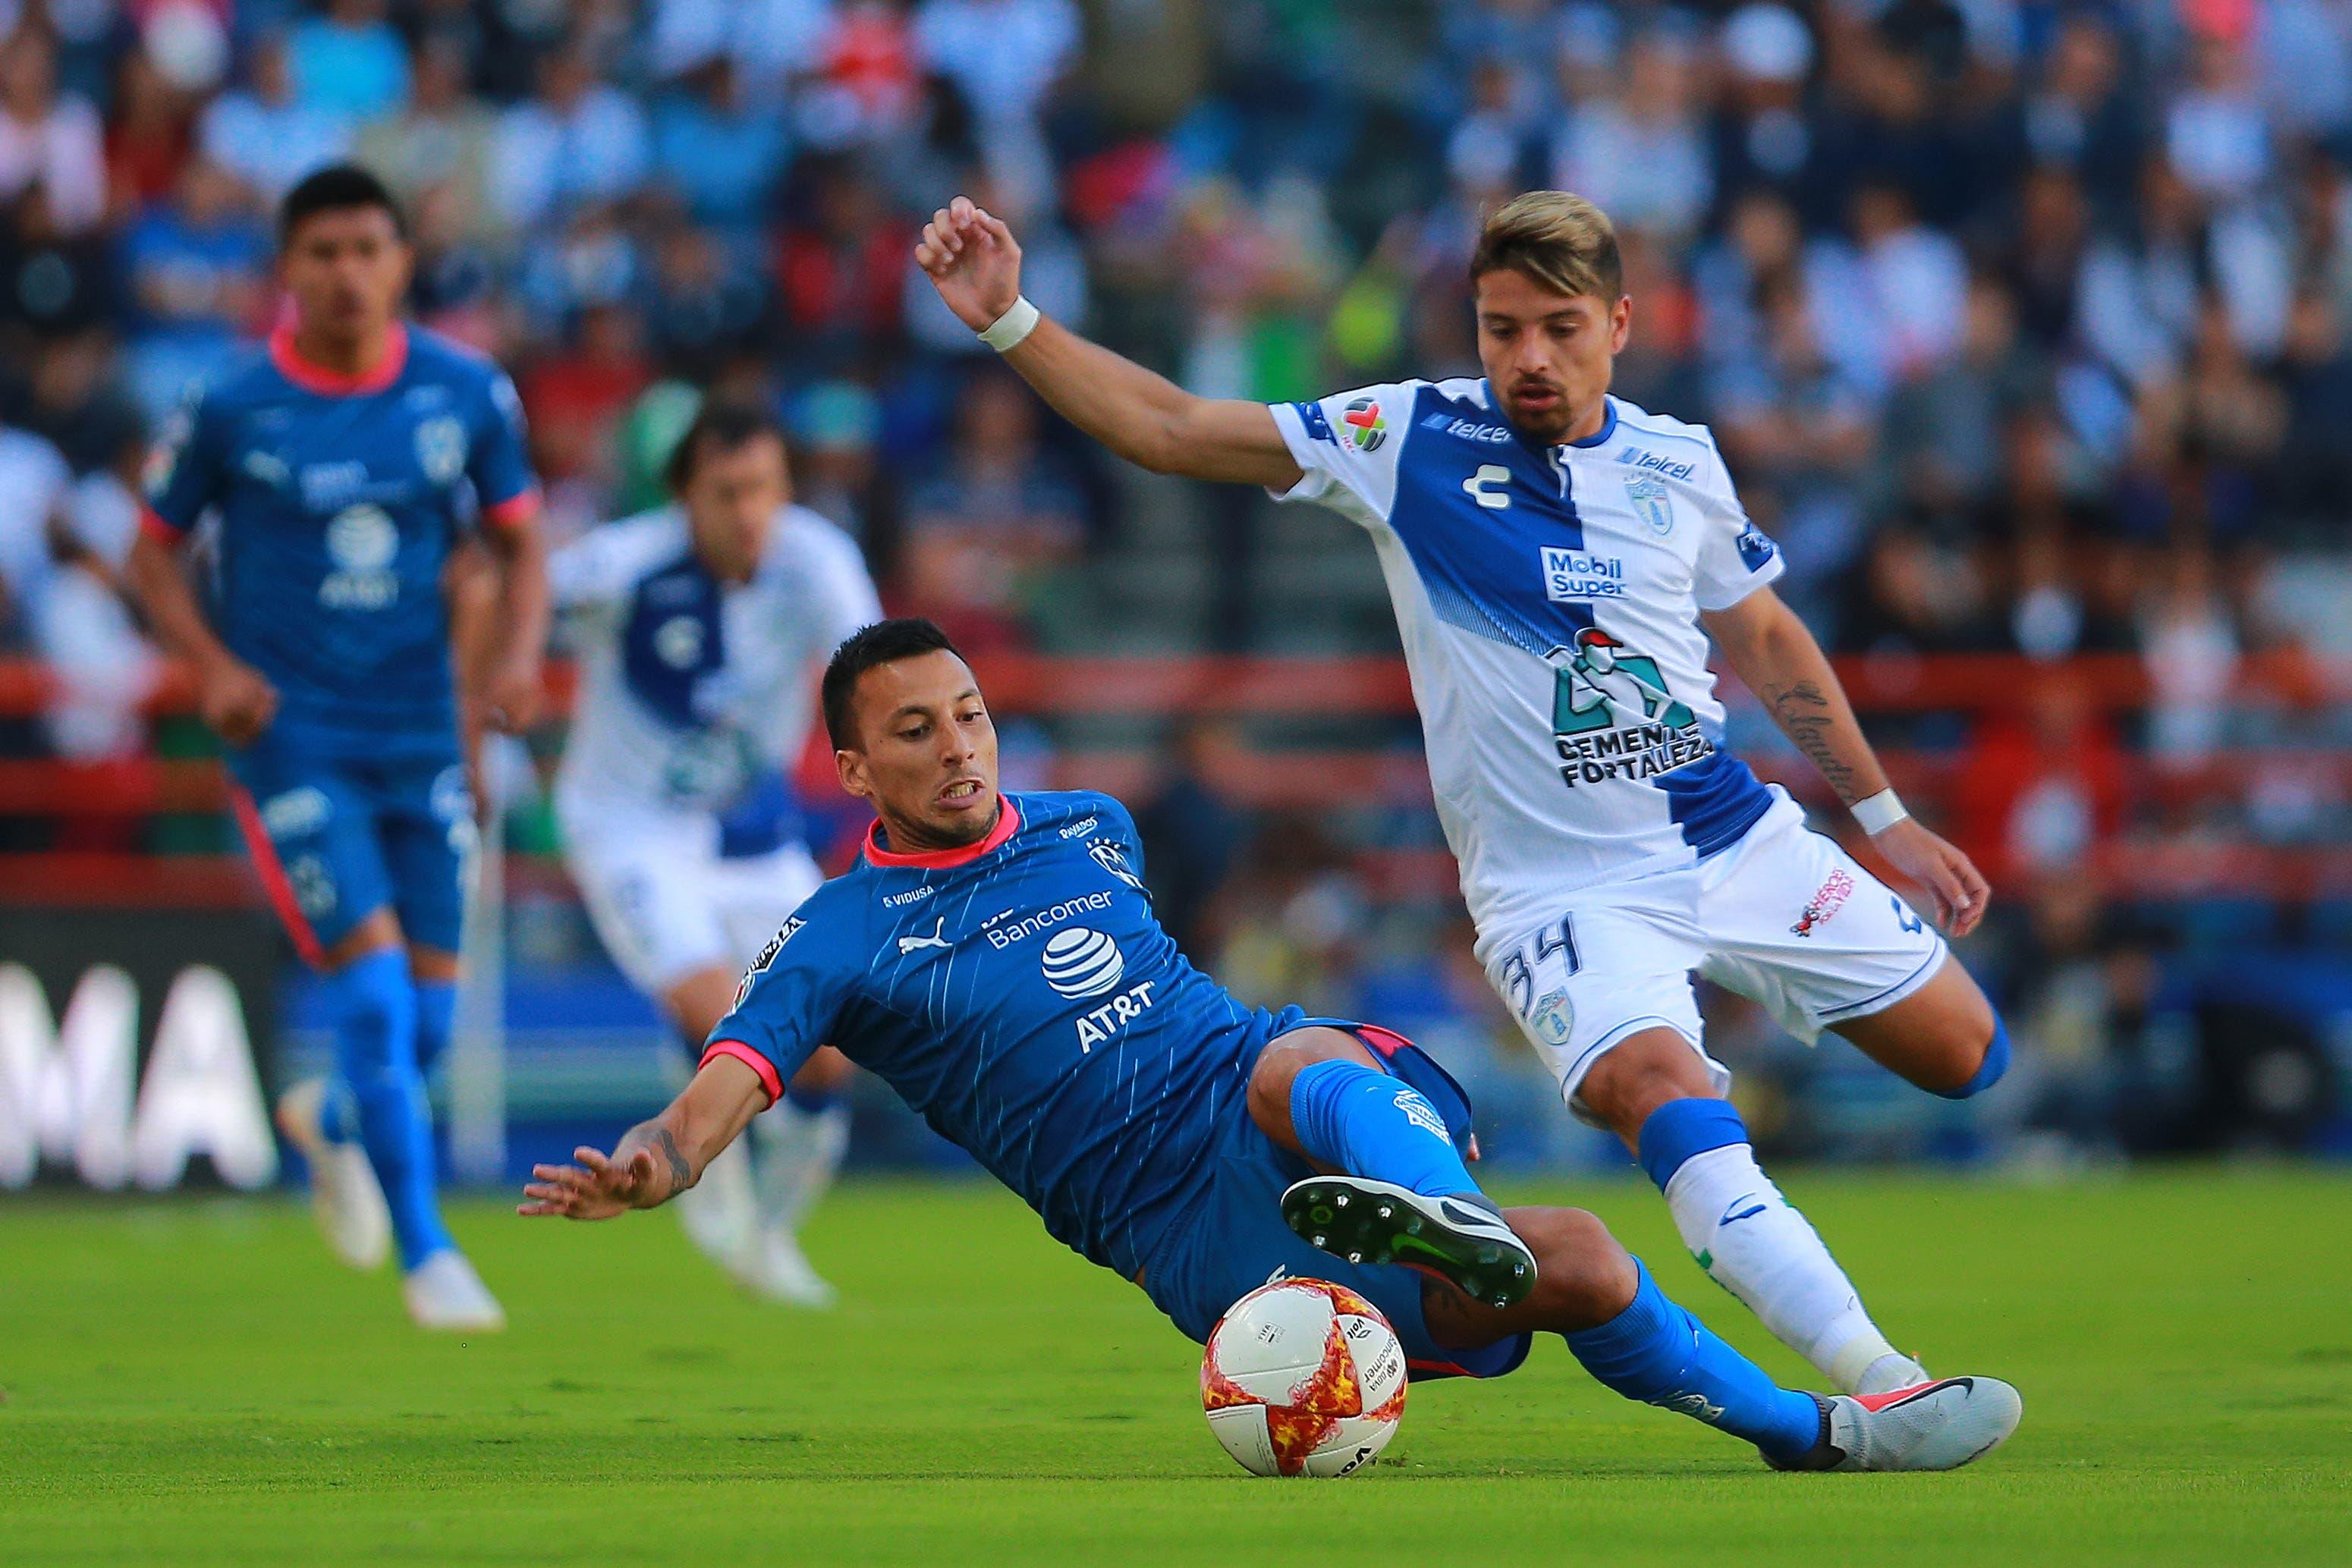 Liga MX: Ve en vivo Monterrey vs Pachuca Jornada 1 Clausura 2019